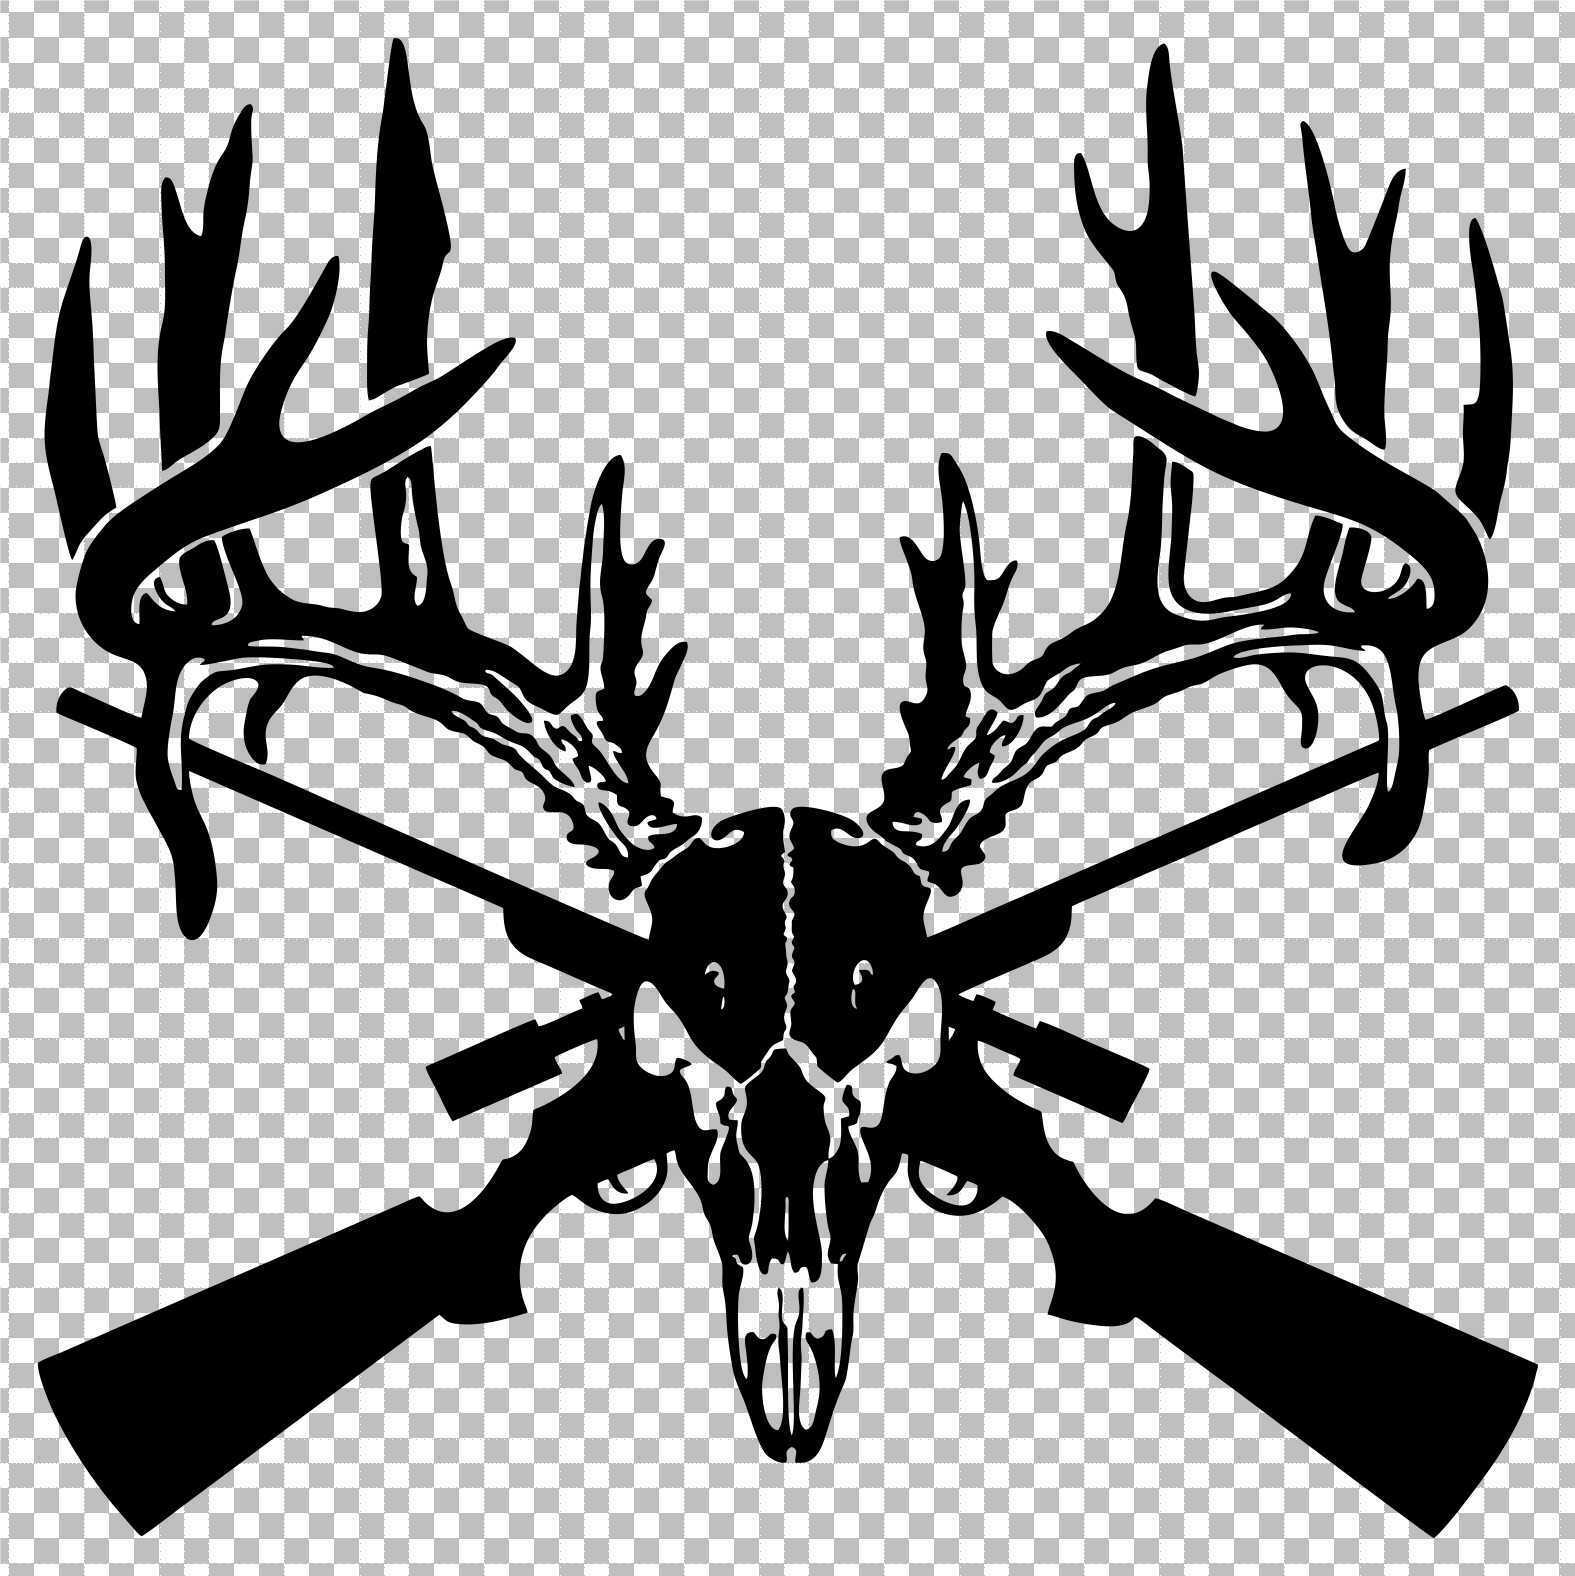 BONE LIFE ~Hunter Hunting Hunt Moose Skull Antlers VINYL DECAL Car Truck Sticker